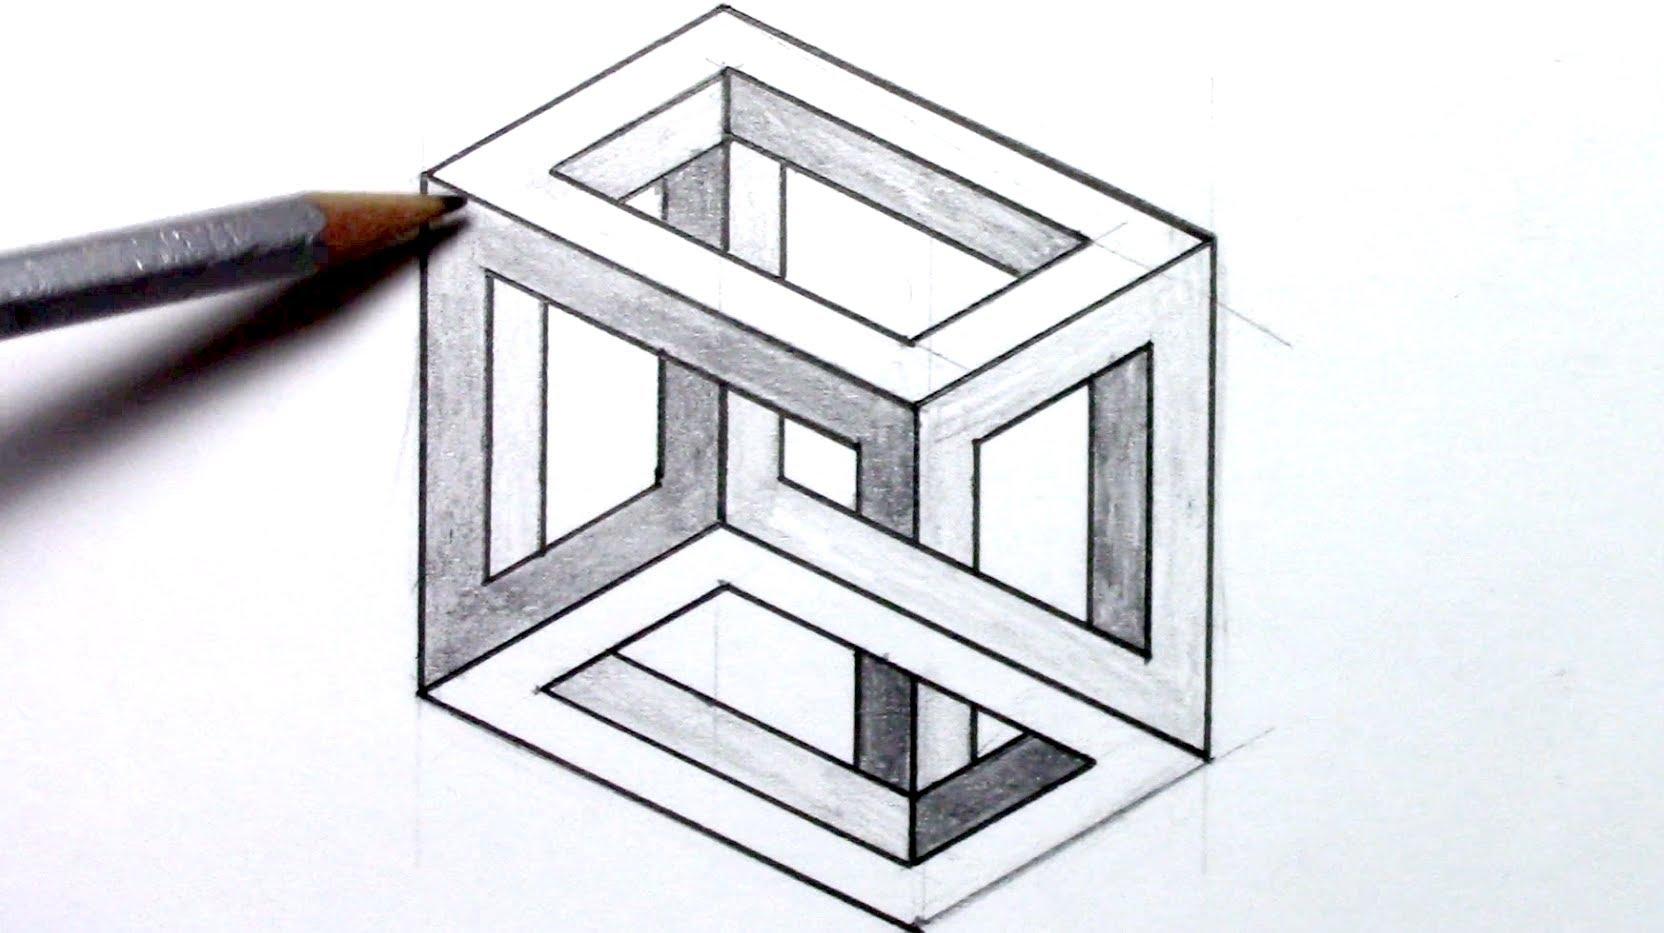 Drawn optical illusion  Illusion Cube an Illusion